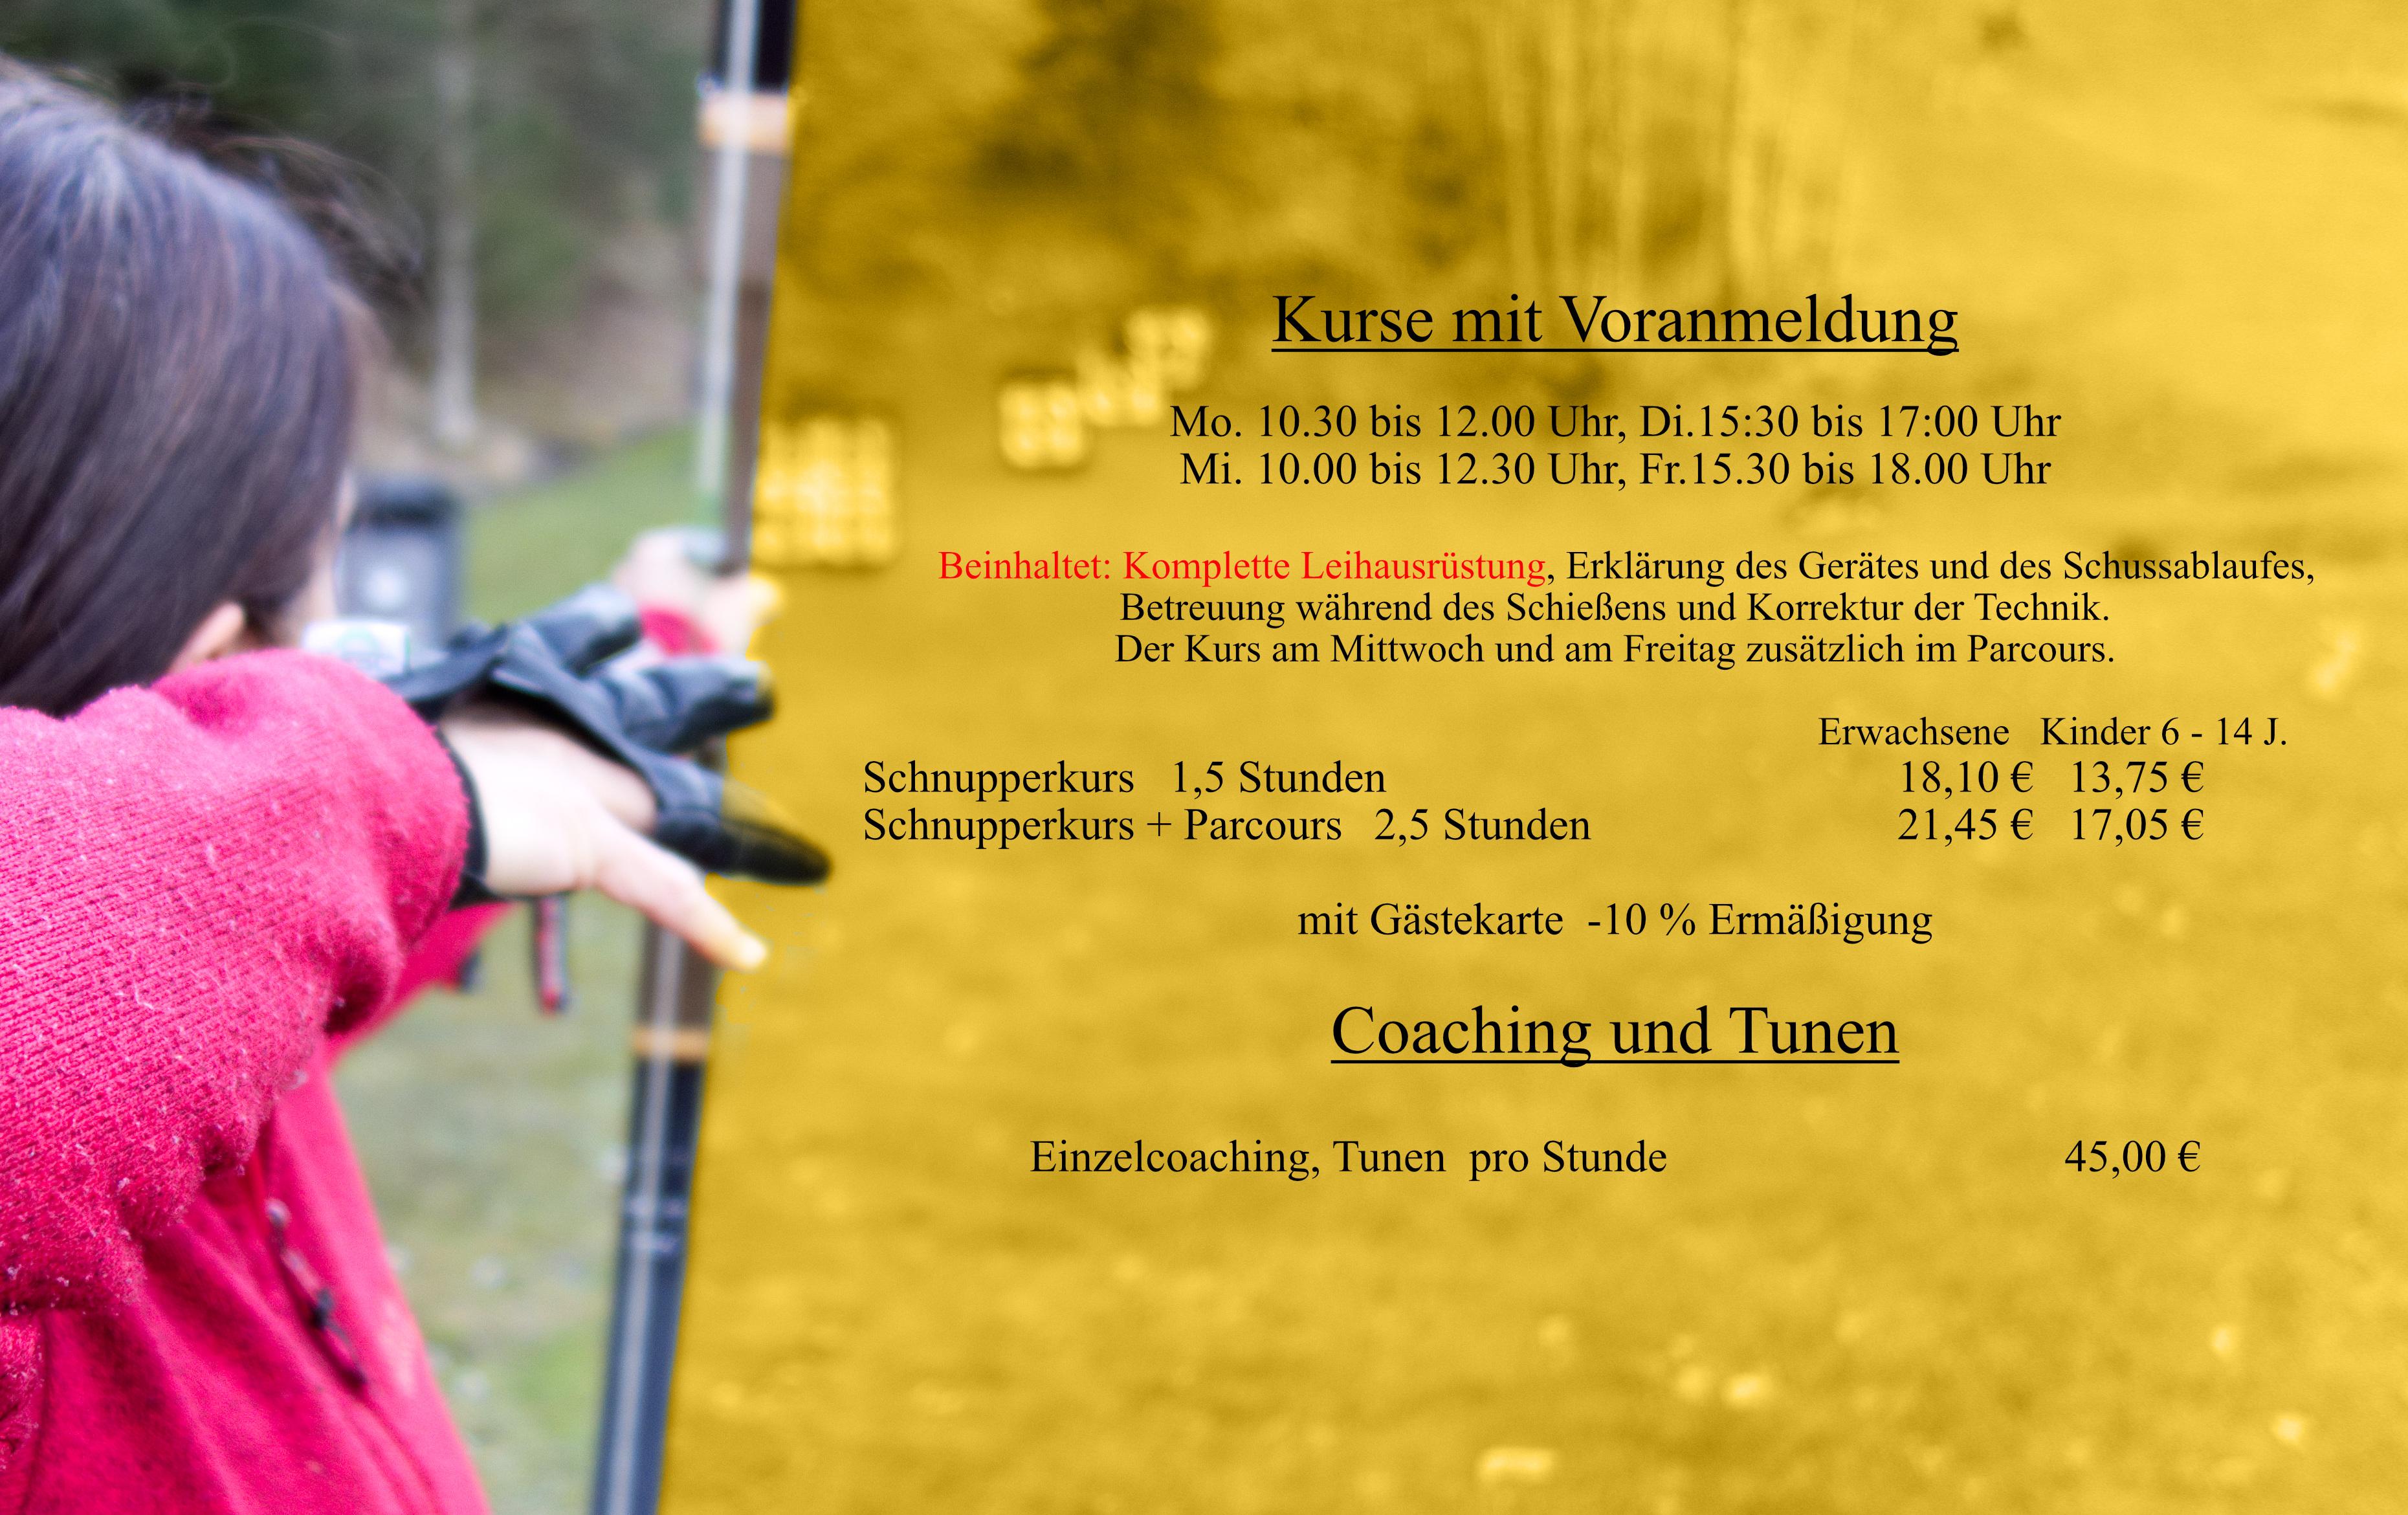 Bowhunting Chiemgau, Schiessen unter Freunden, Roman Heigenhauser, Maiergschwendt.3, 83324 Ruhpolding